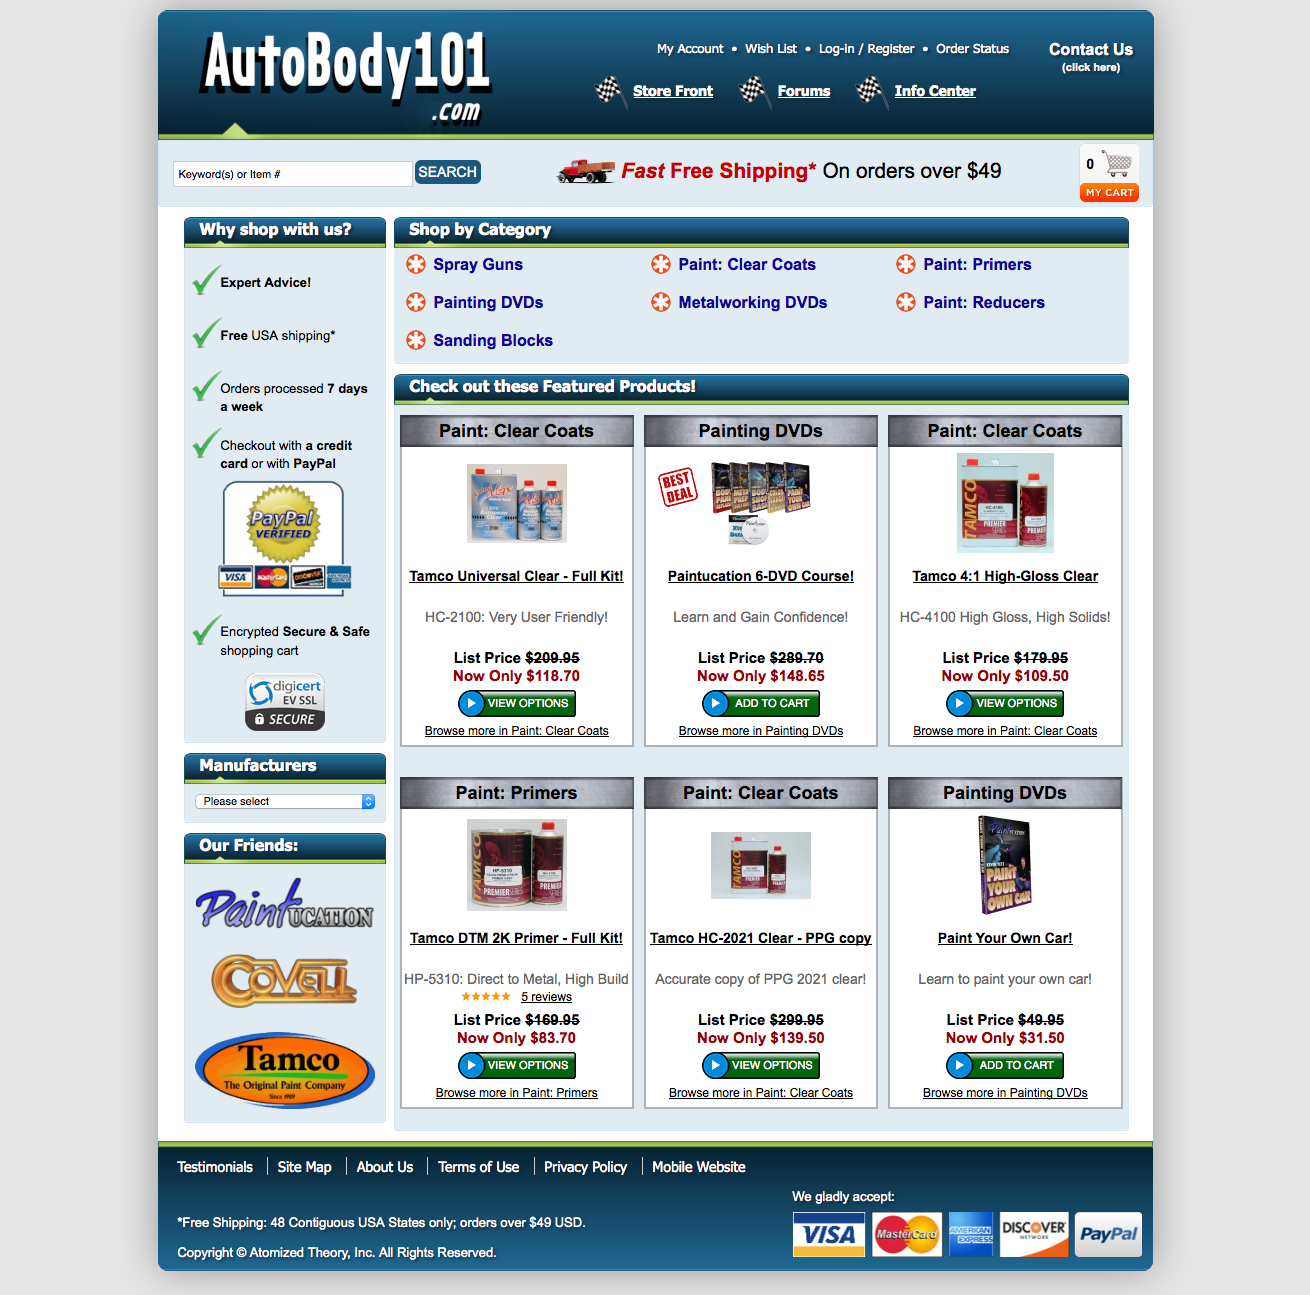 autobody101.com